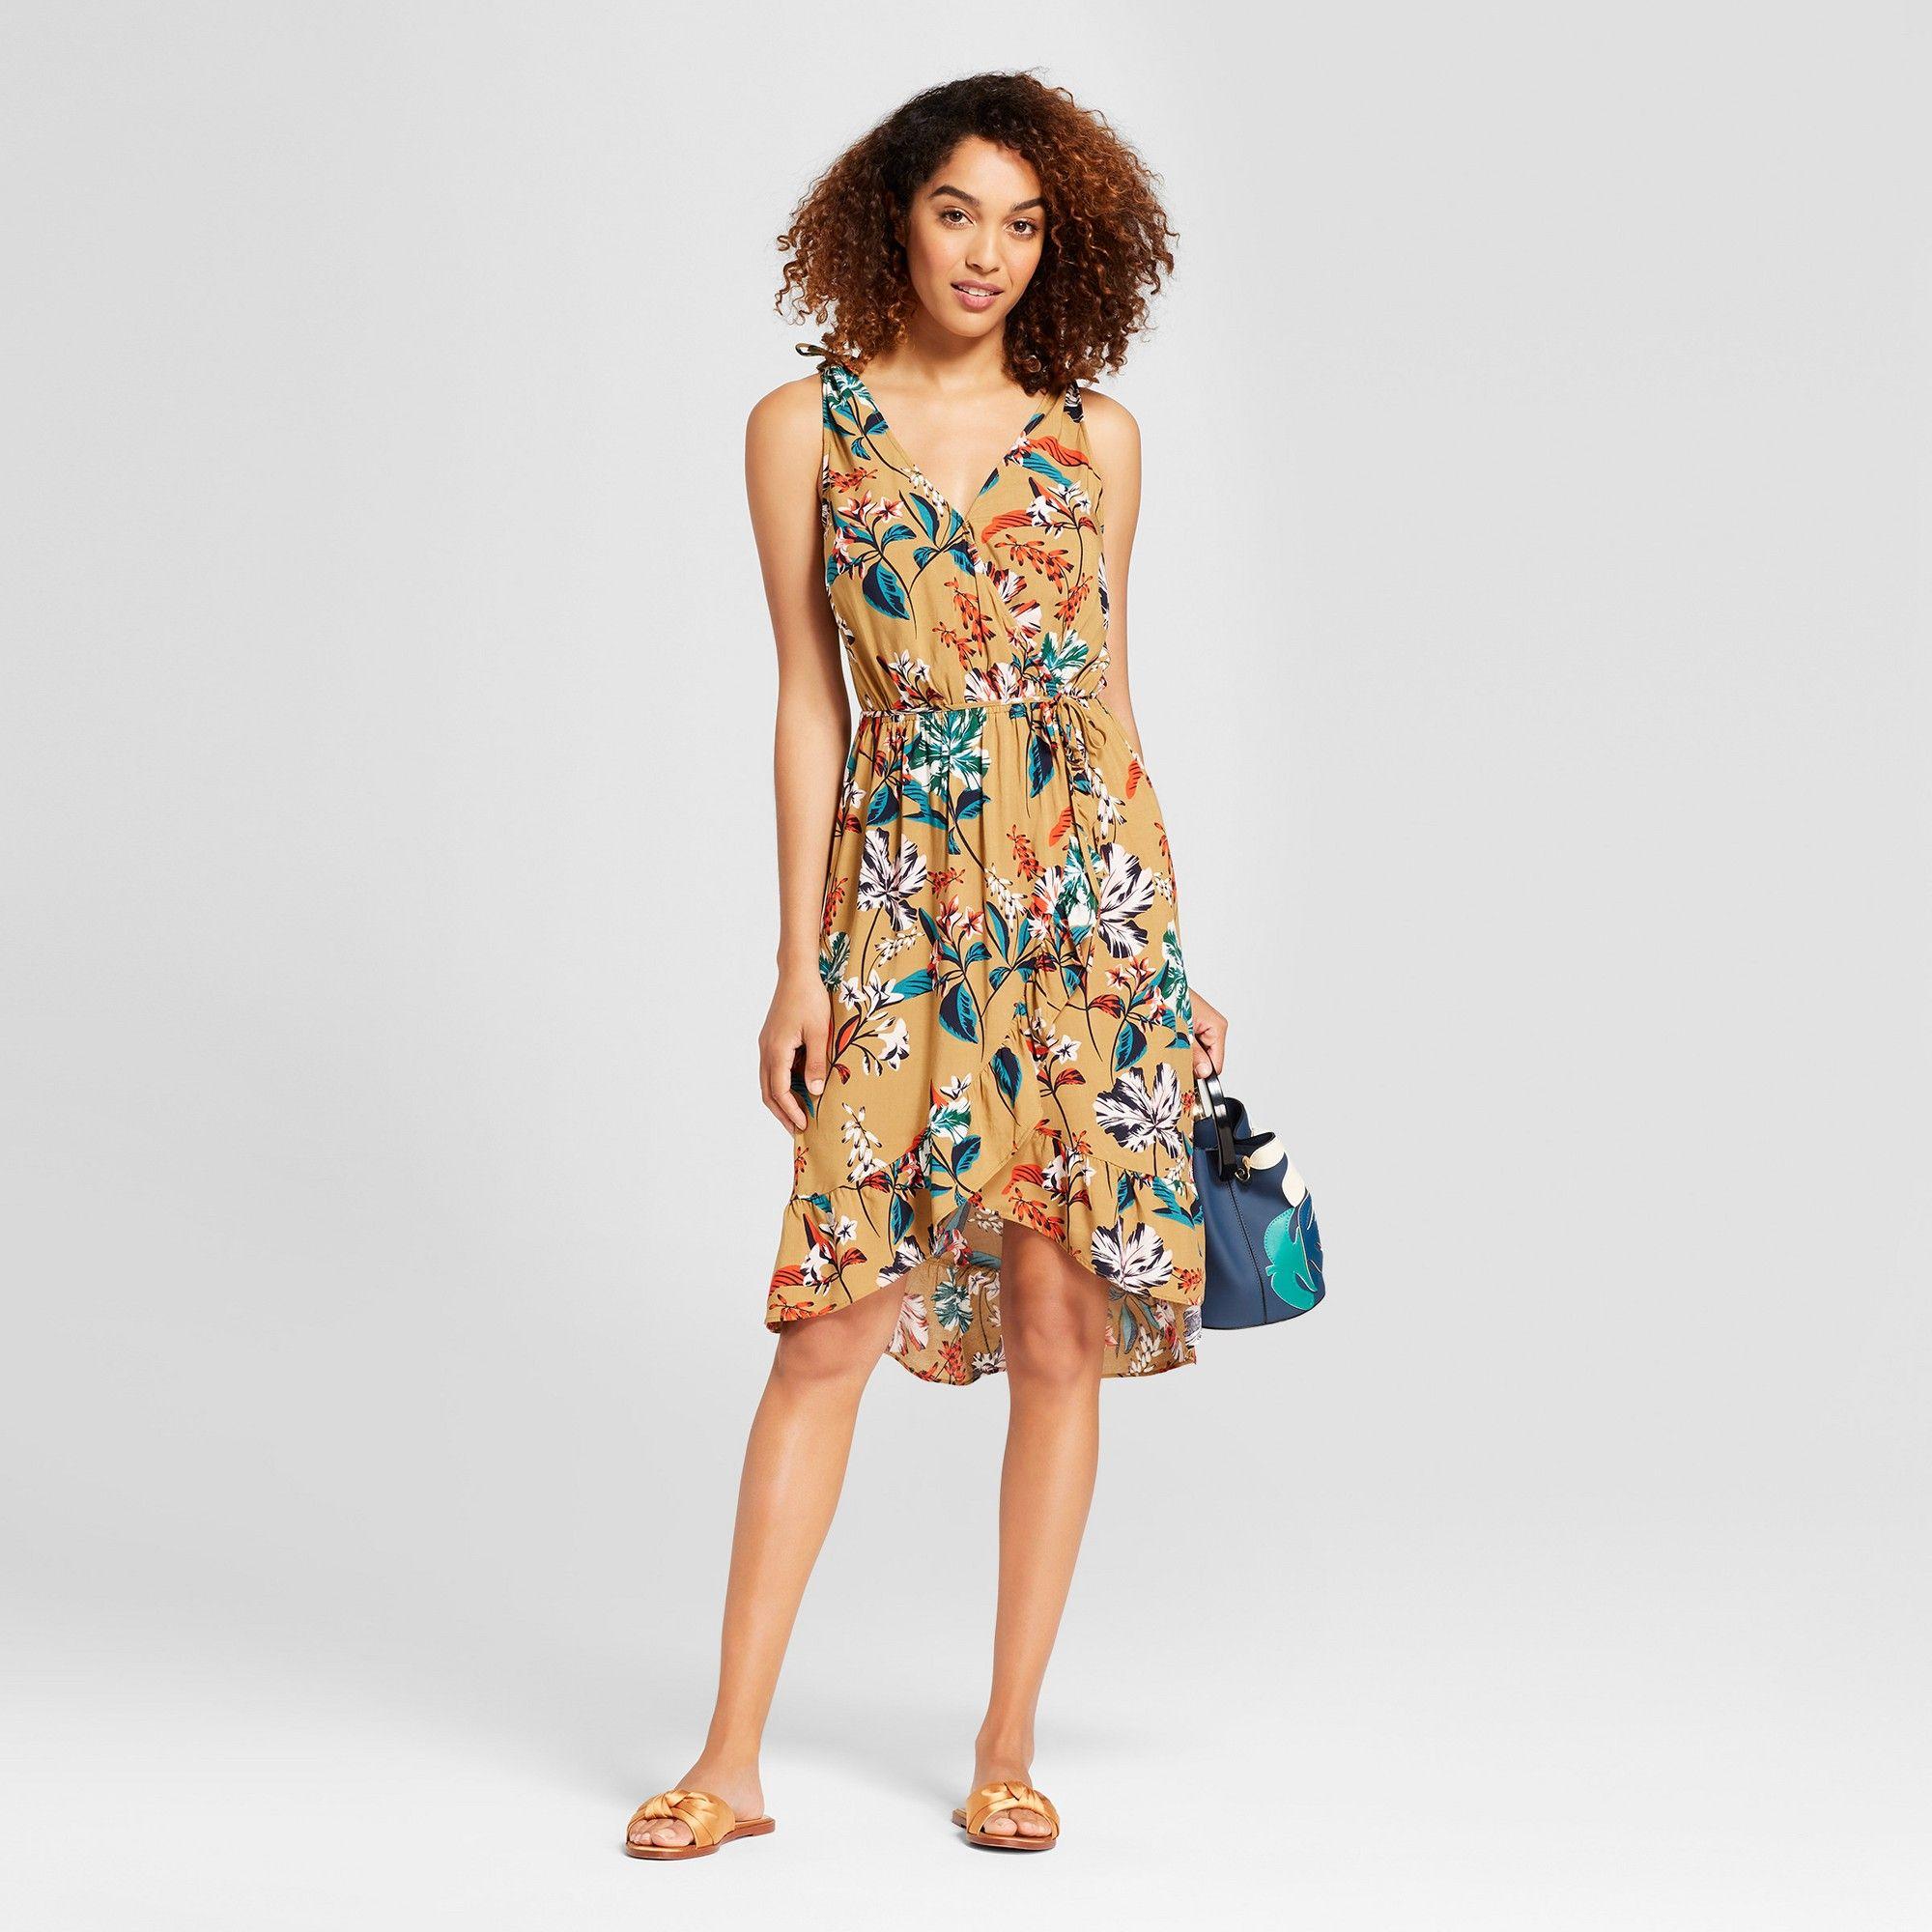 f6ad4f47dc2f98 Women's Floral Print Sleeveless Wrap Dress - A New Day Tan Xxl, Yellow